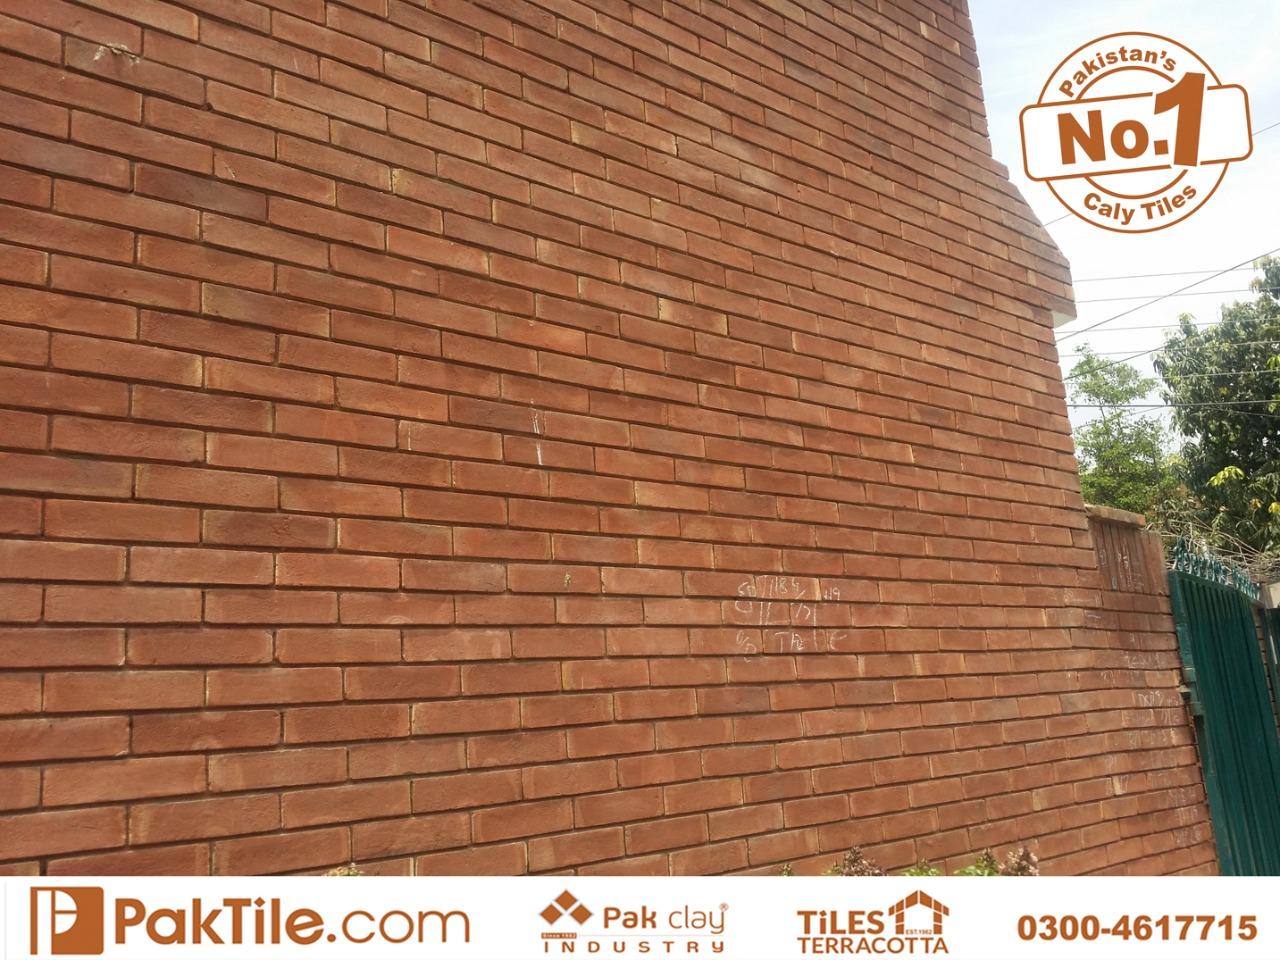 terracotta cladding tiles